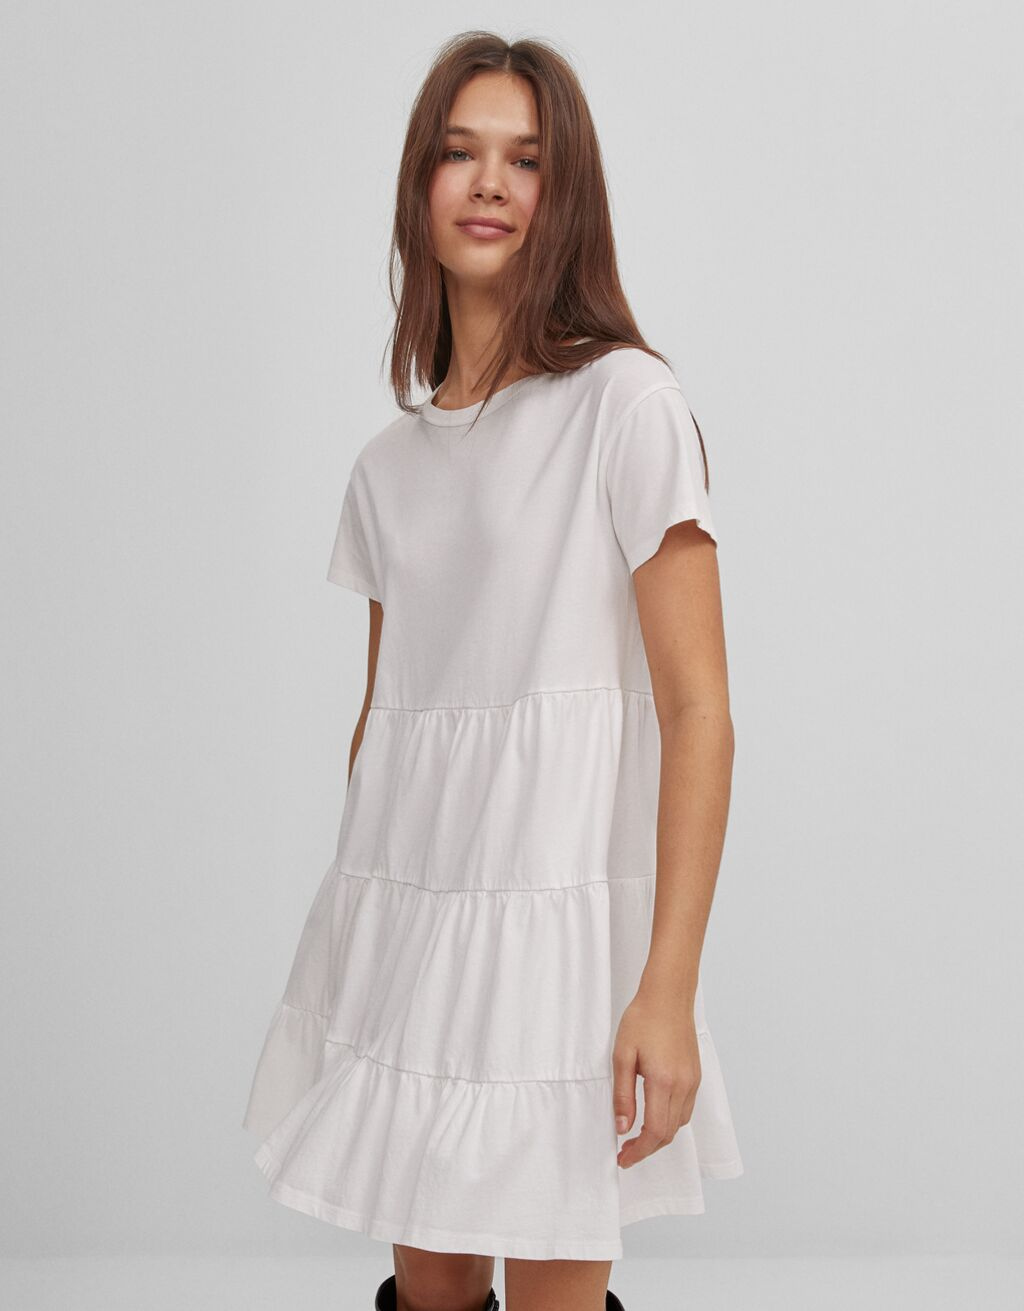 Short baby-doll dress